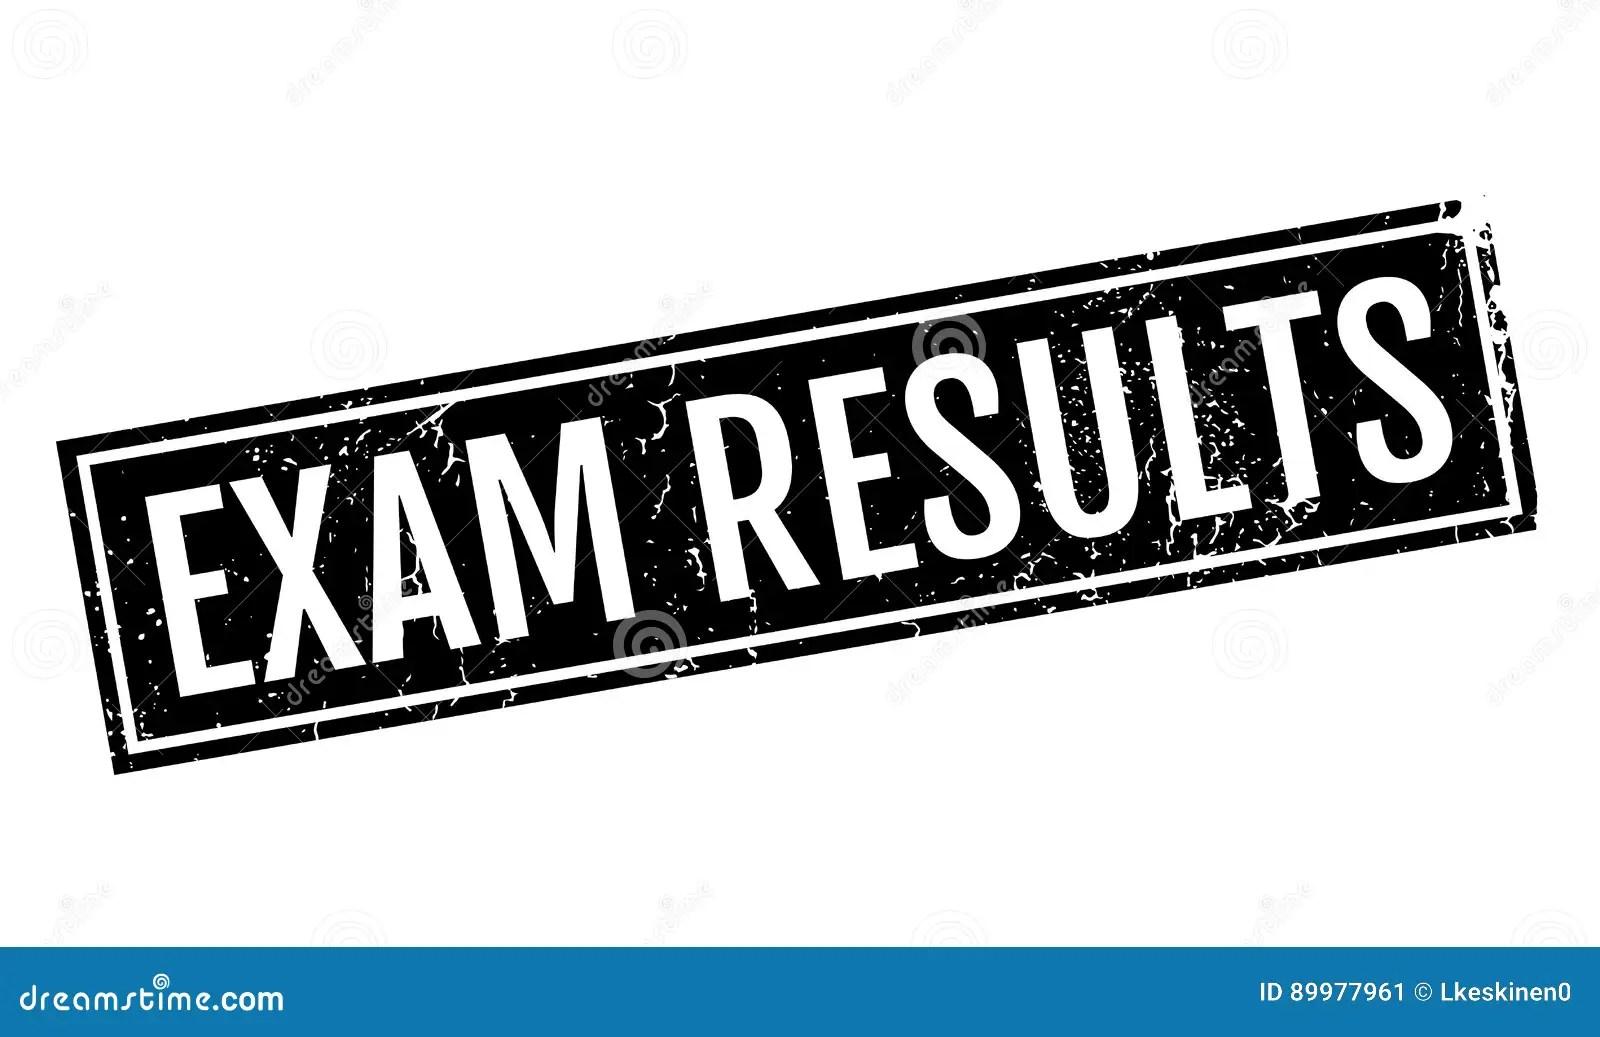 Examinations Cartoons, Illustrations & Vector Stock Images